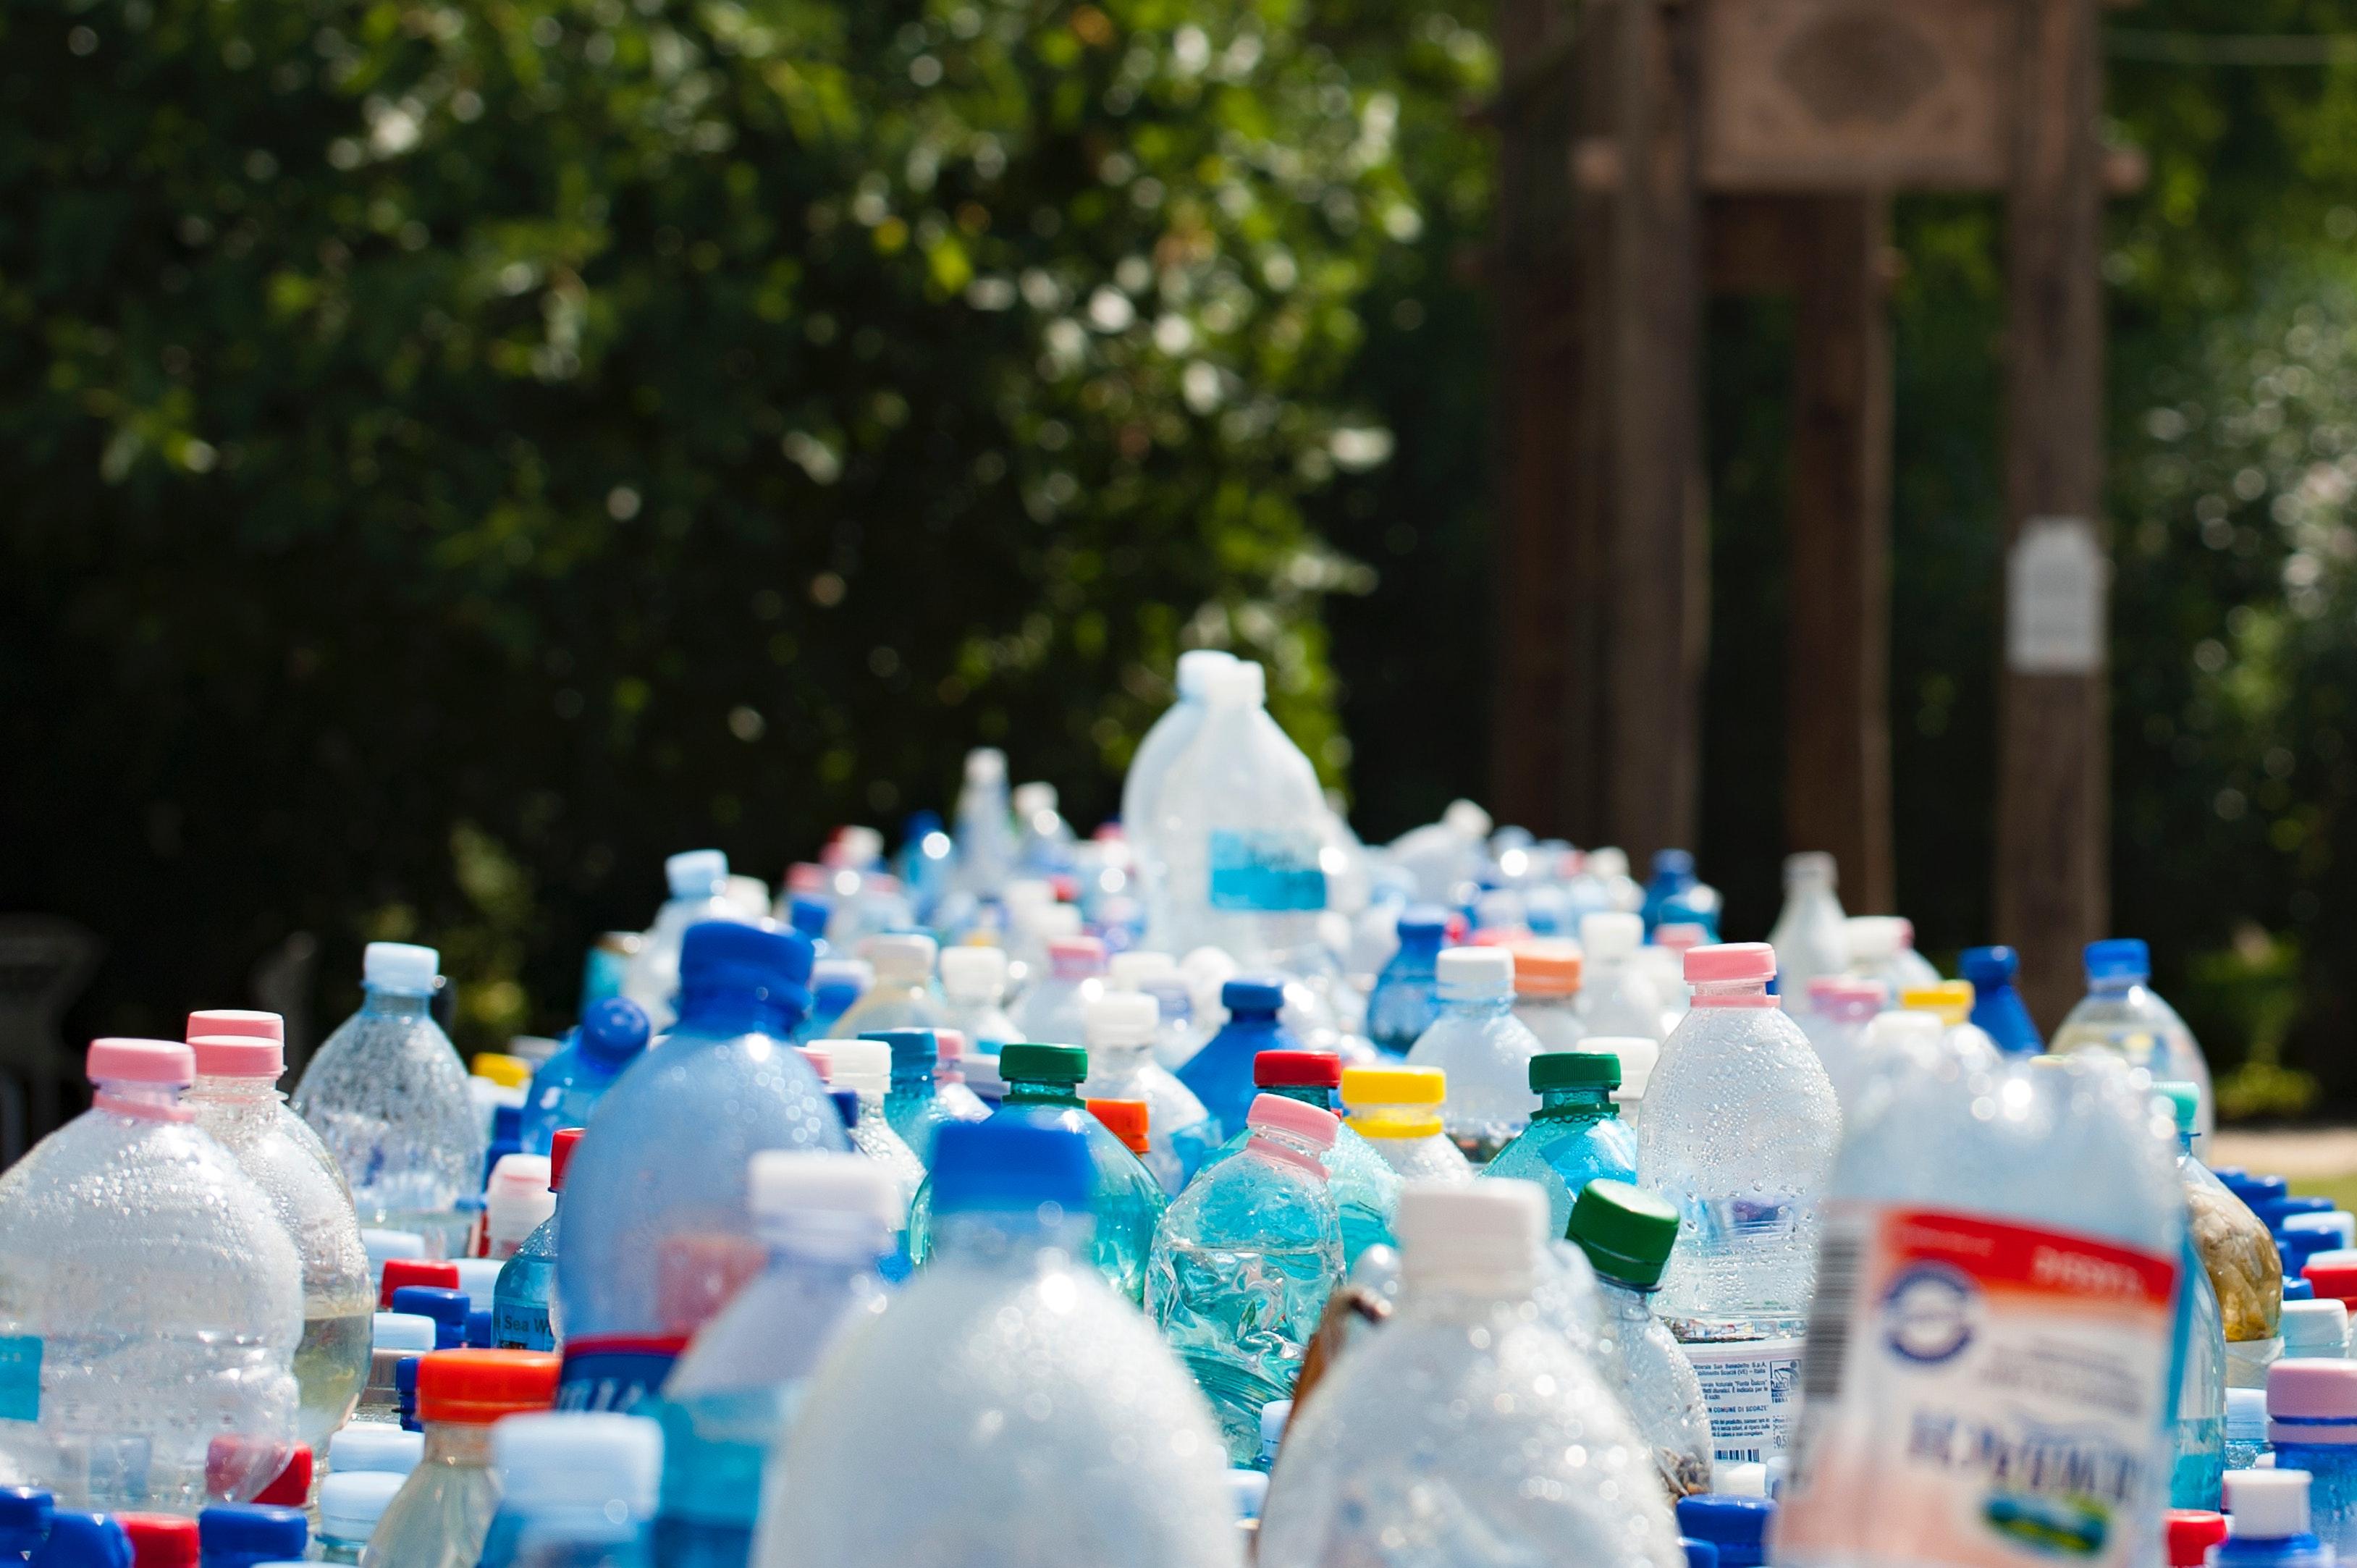 Plastic bottles reduce reuse recylce